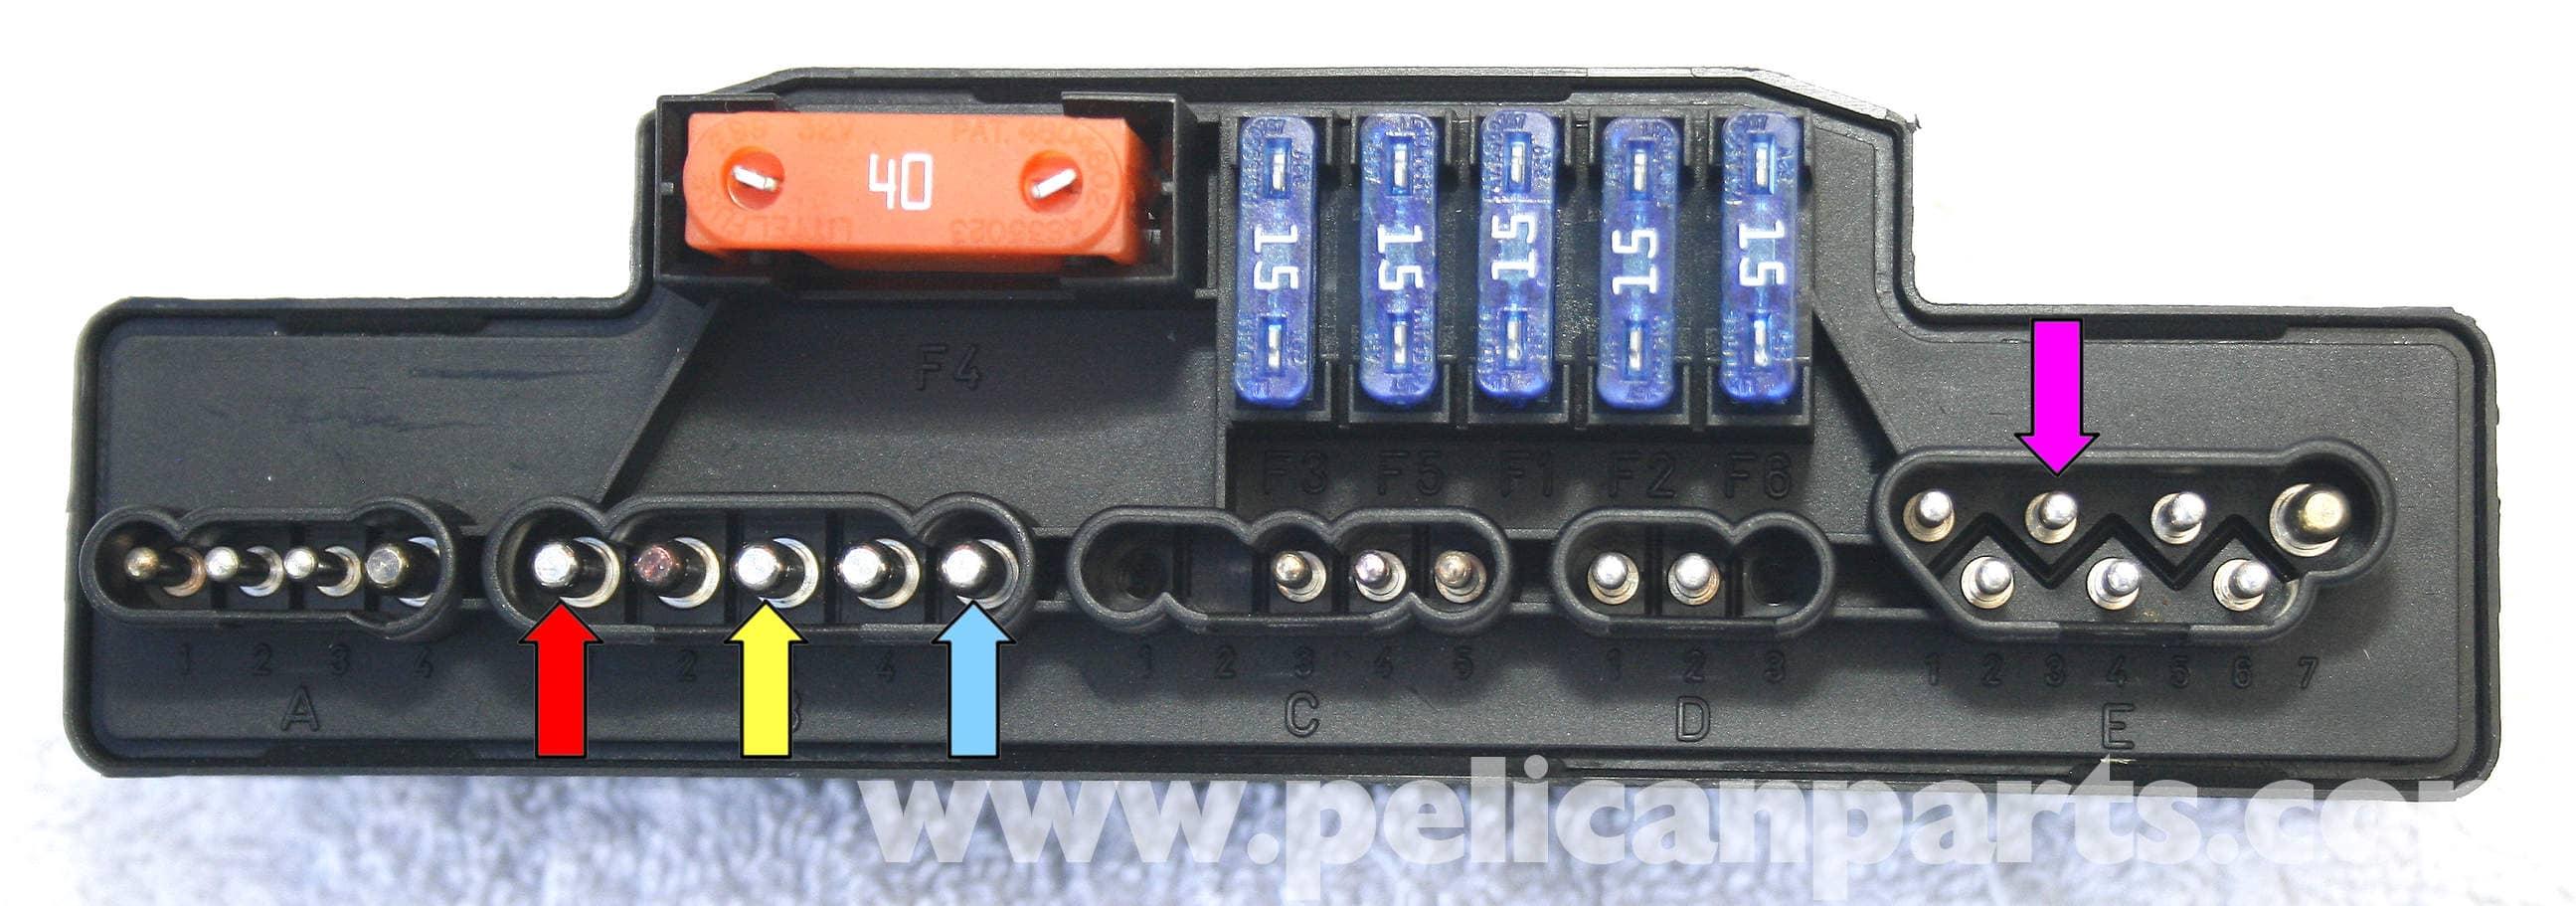 Mercedes-Benz SLK 230 K40 Overload Protection Relay Repair | 1998 ...